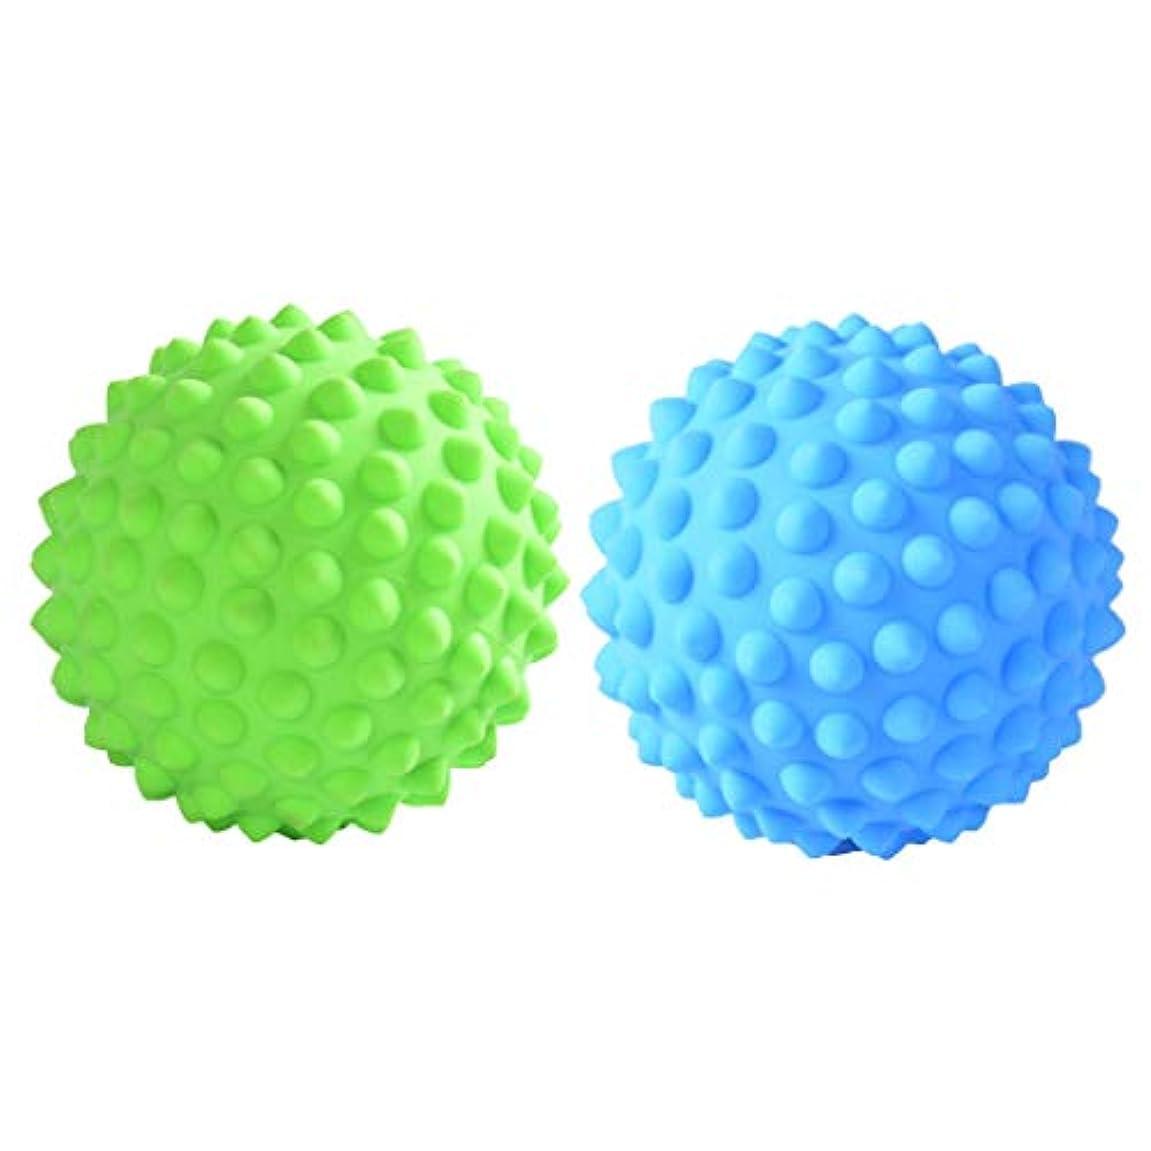 sharprepublic マッサージローラーボール 指圧ボール トリガーポイント疲れ解消ボール ヨガ疲労軽減 筋膜リリース2個